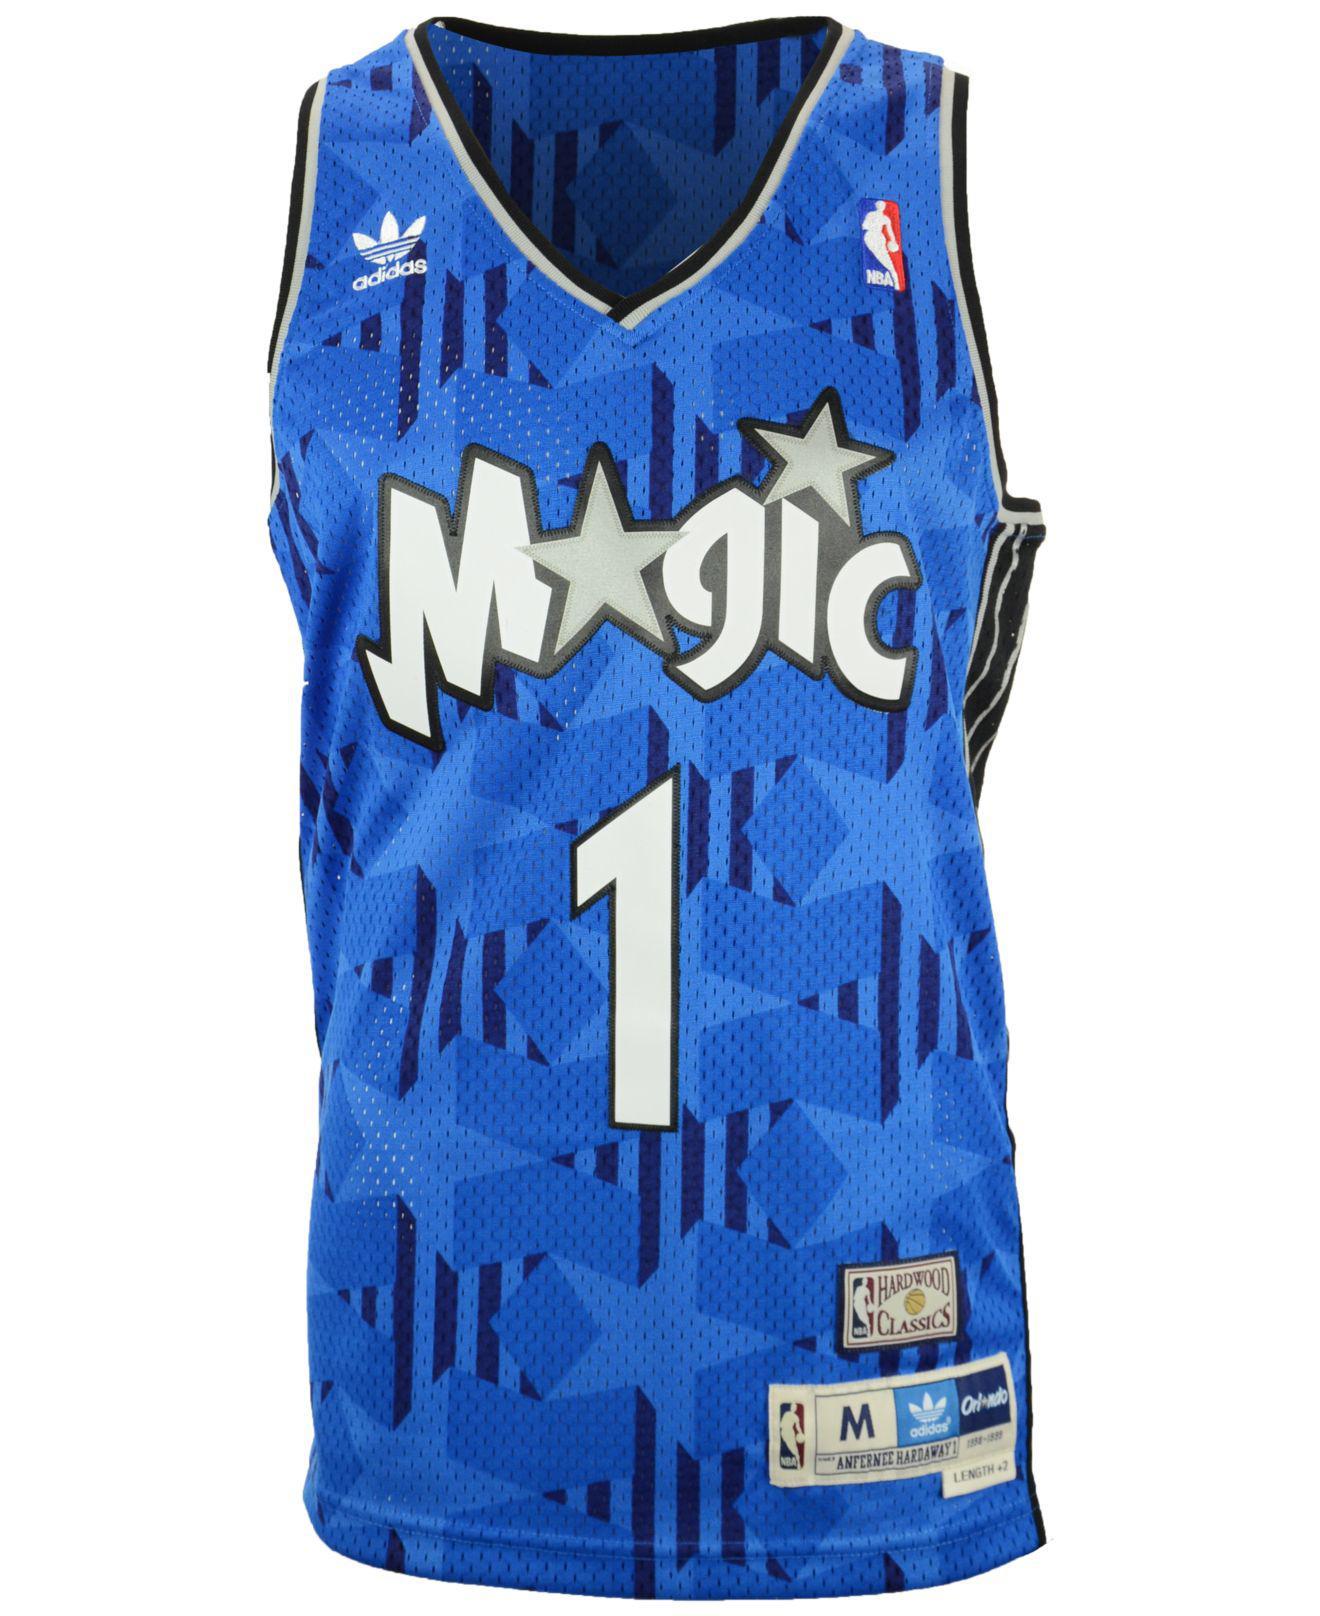 60d123bc2c0 ... czech lyst adidas mens penny hardaway orlando magic swingman jersey in  blue for men d3567 59aa6